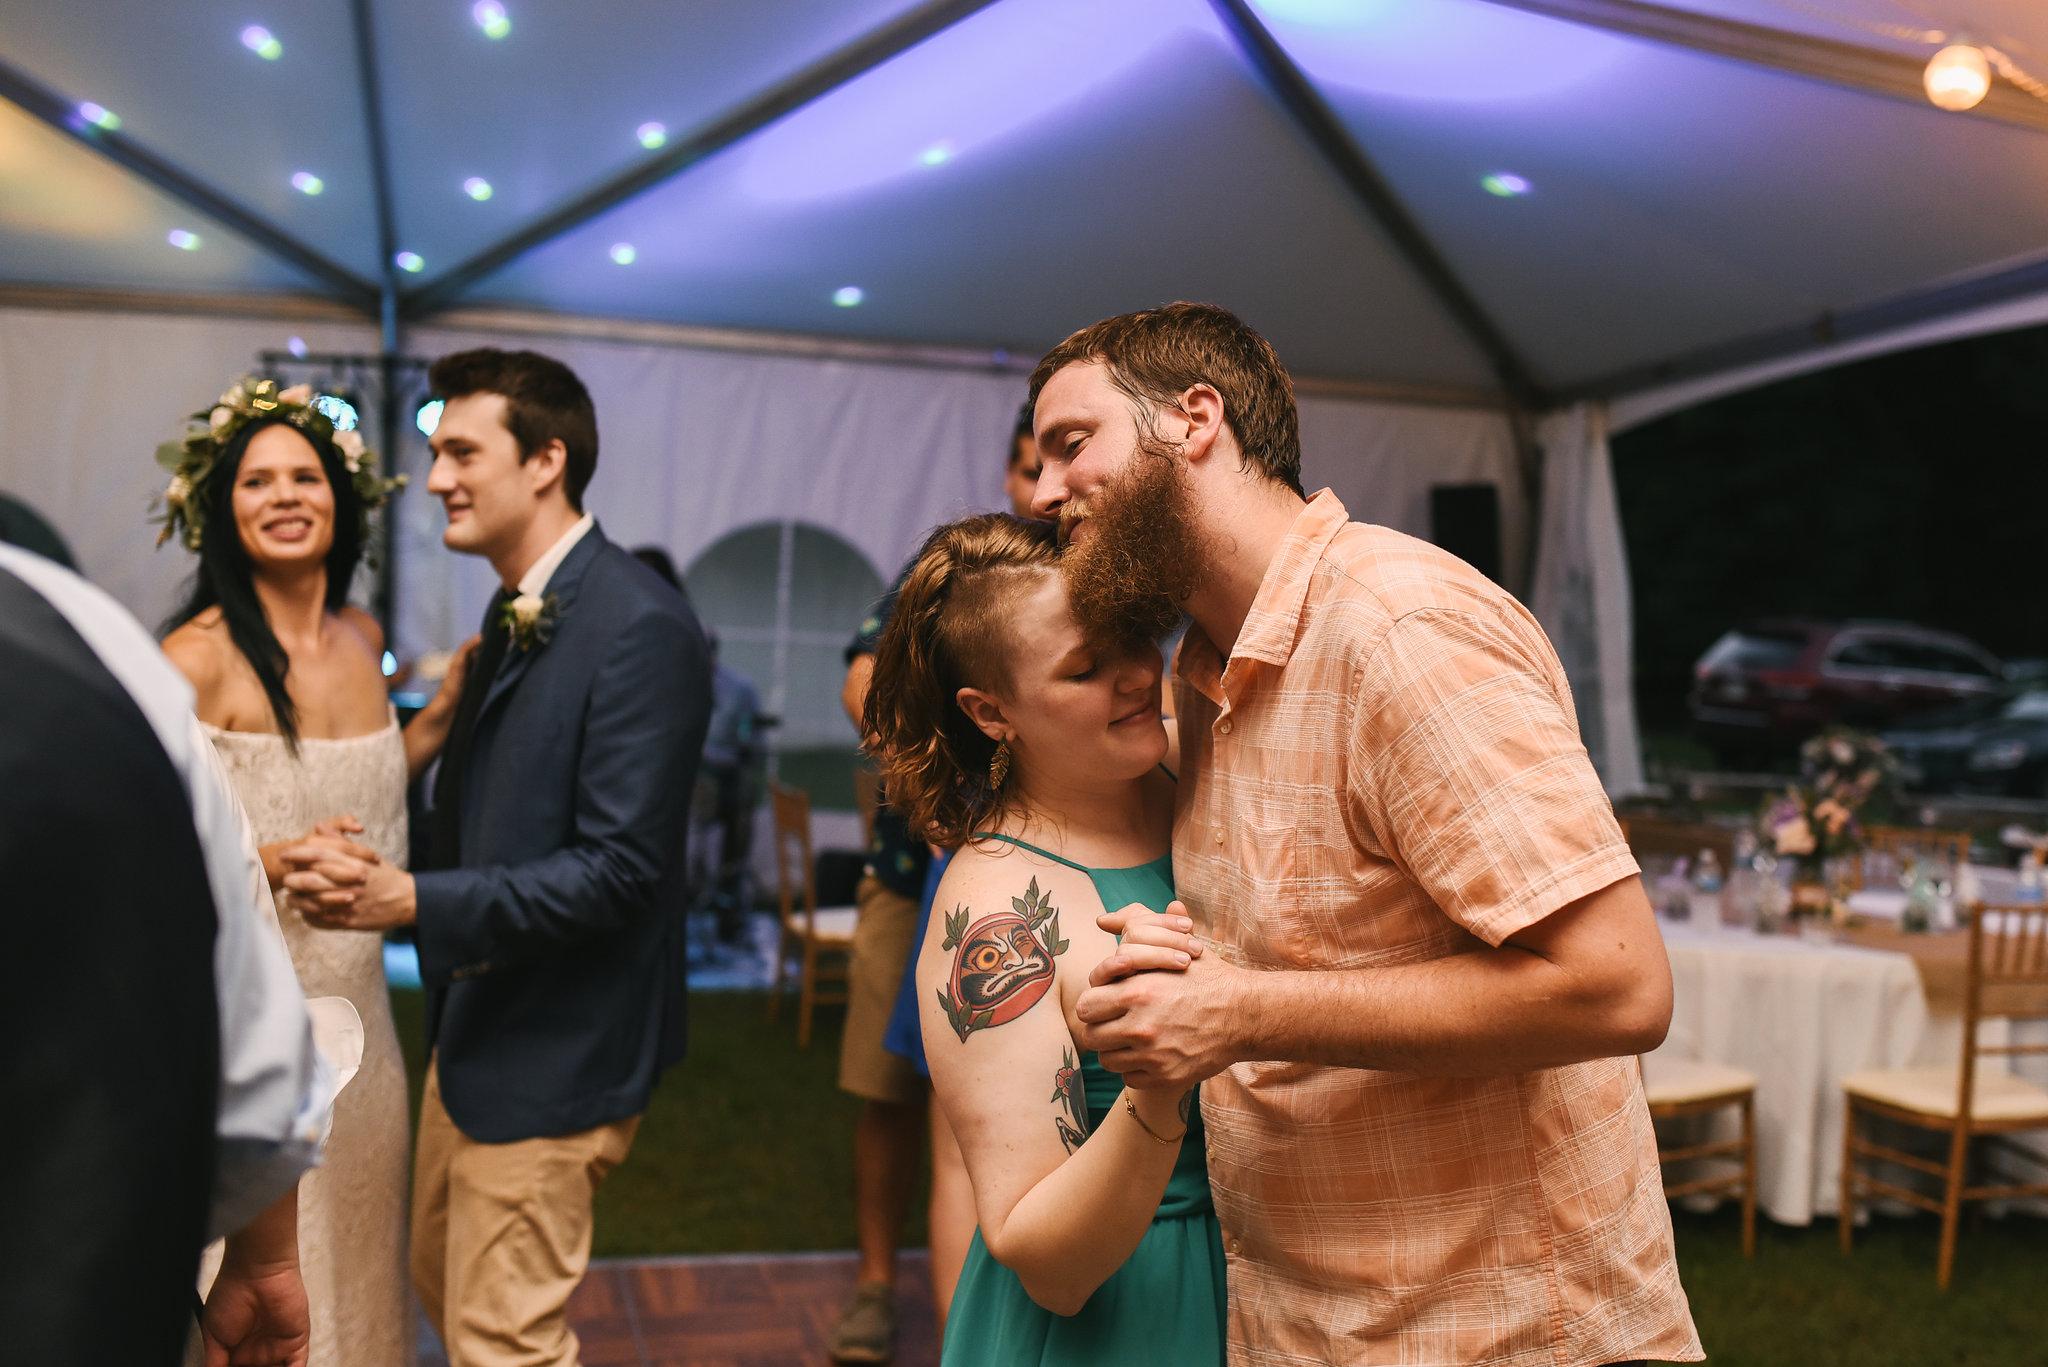 Maryland, Eastern Shore, Baltimore Wedding Photographer, Romantic, Boho, Backyard Wedding, Nature, Couple Slow Dancing at Reception